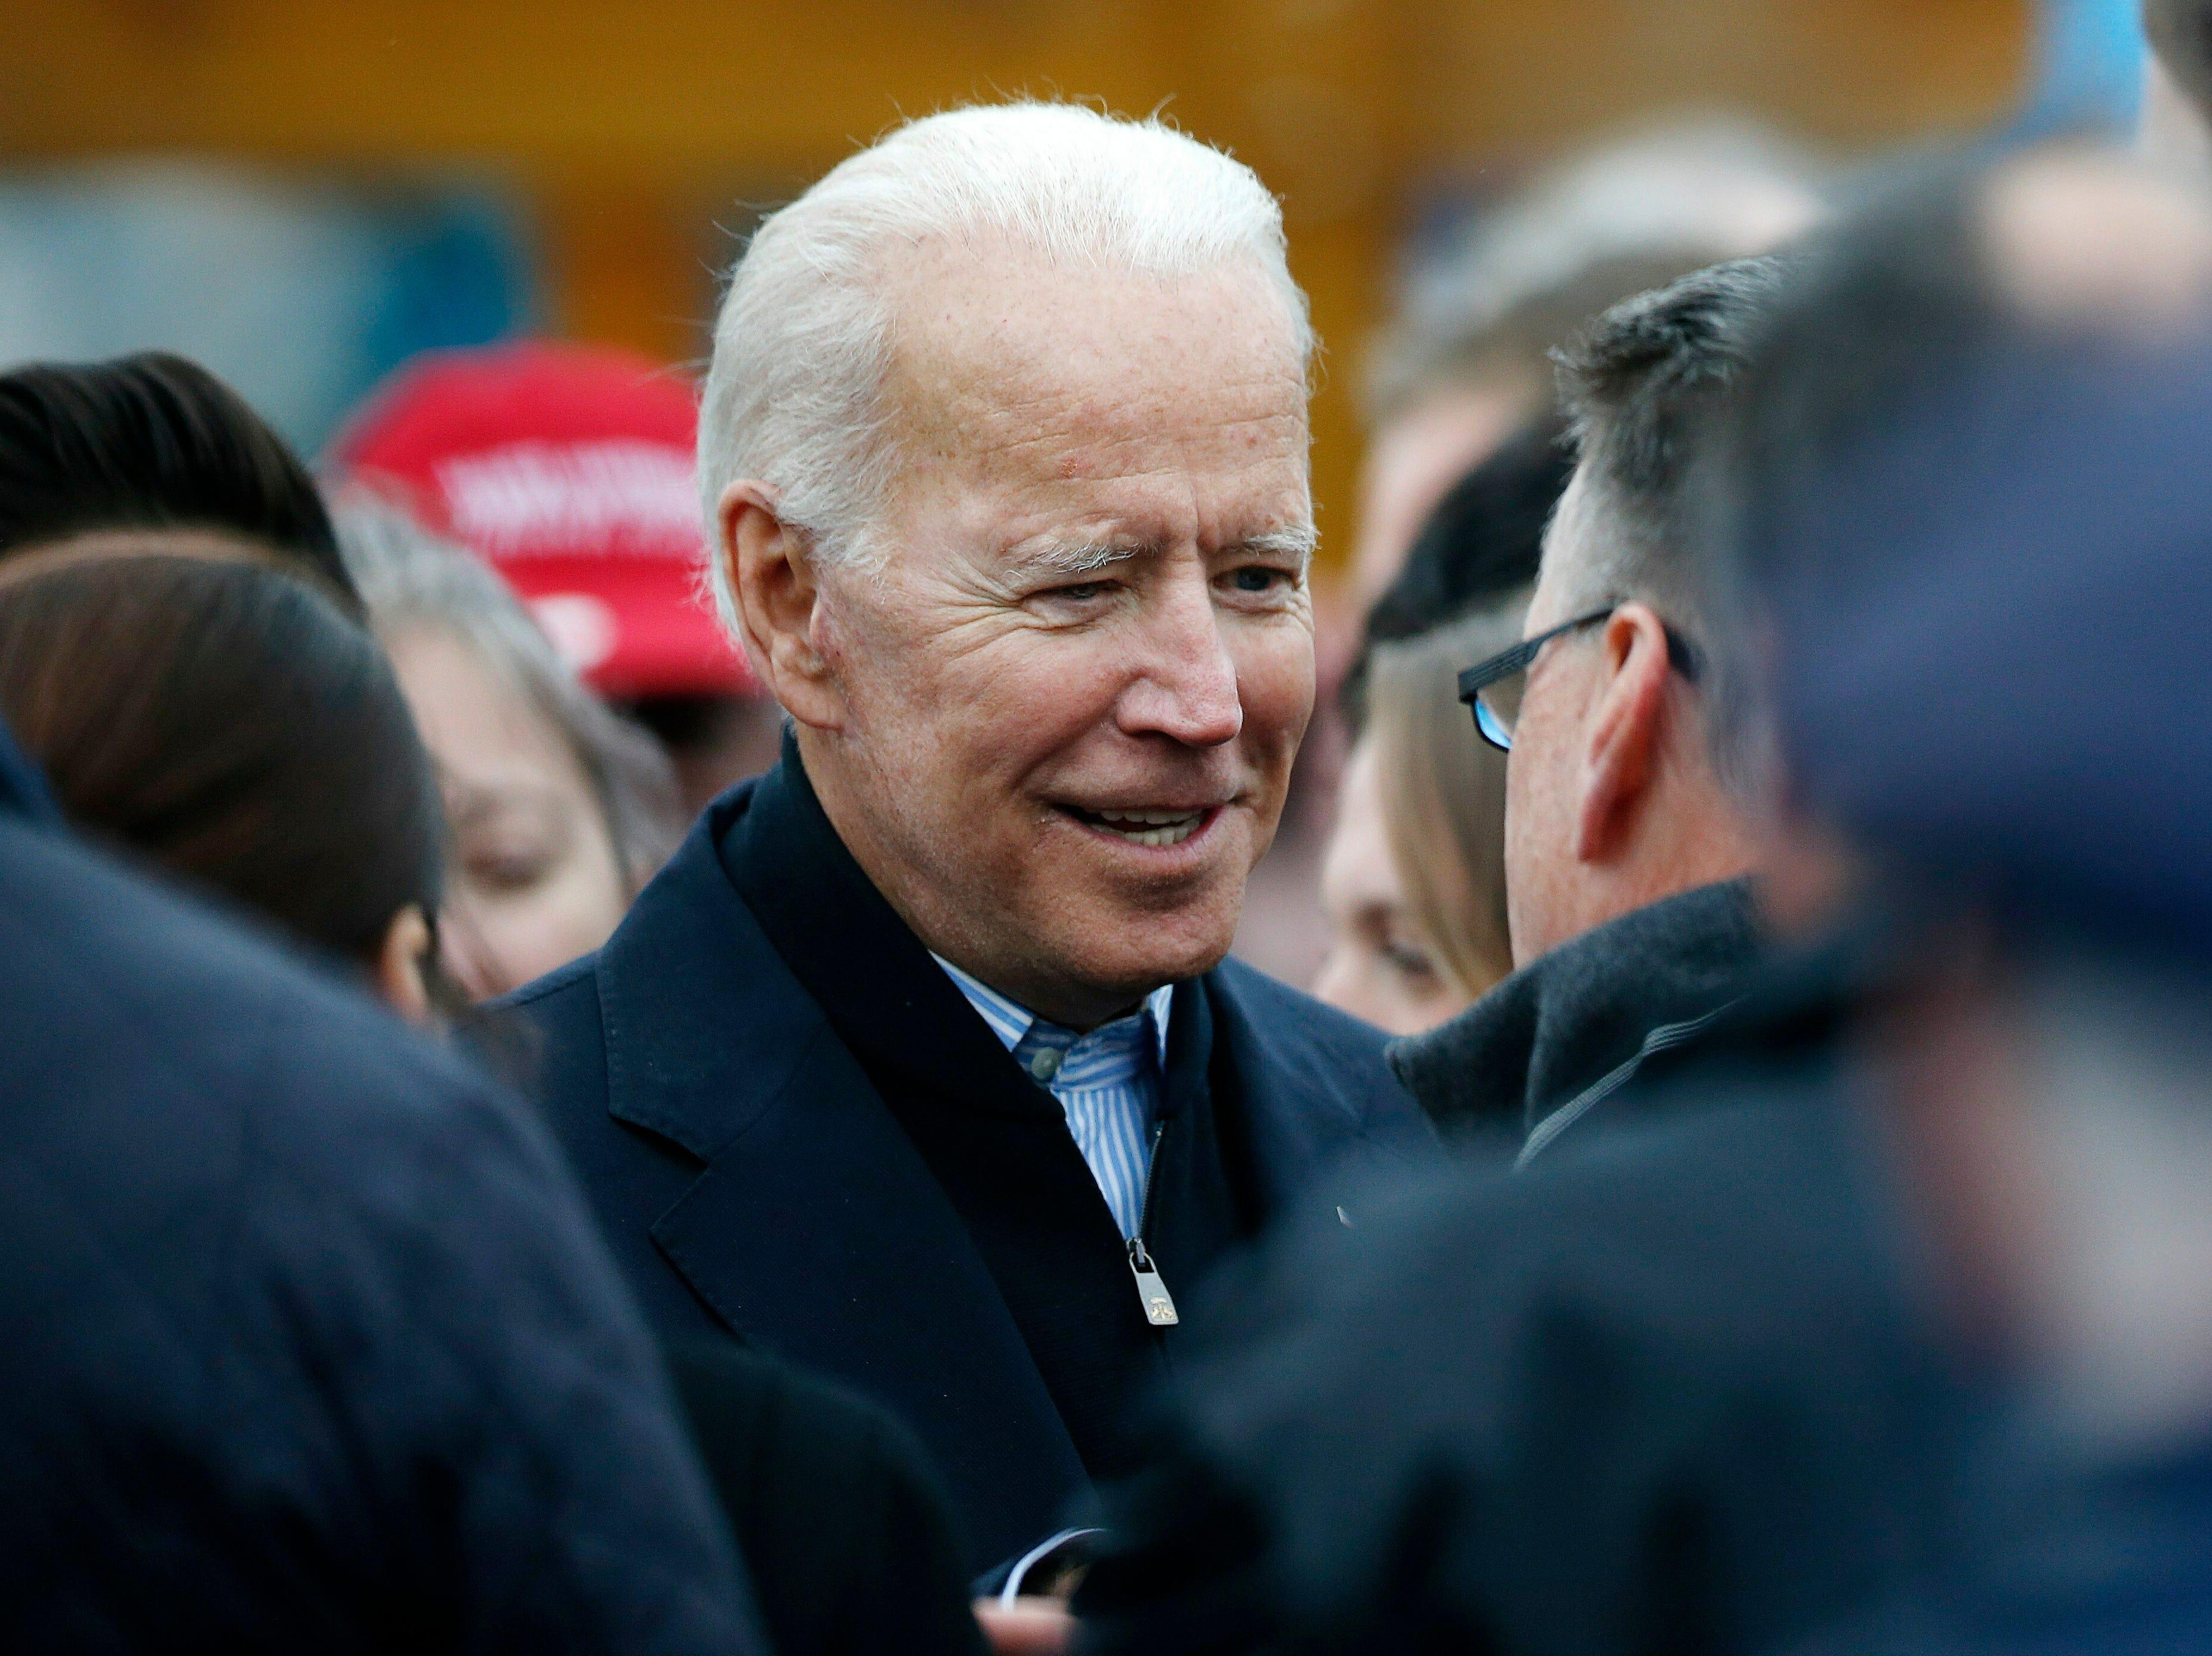 Joe Biden's complicated opposition to busing for school desegregation